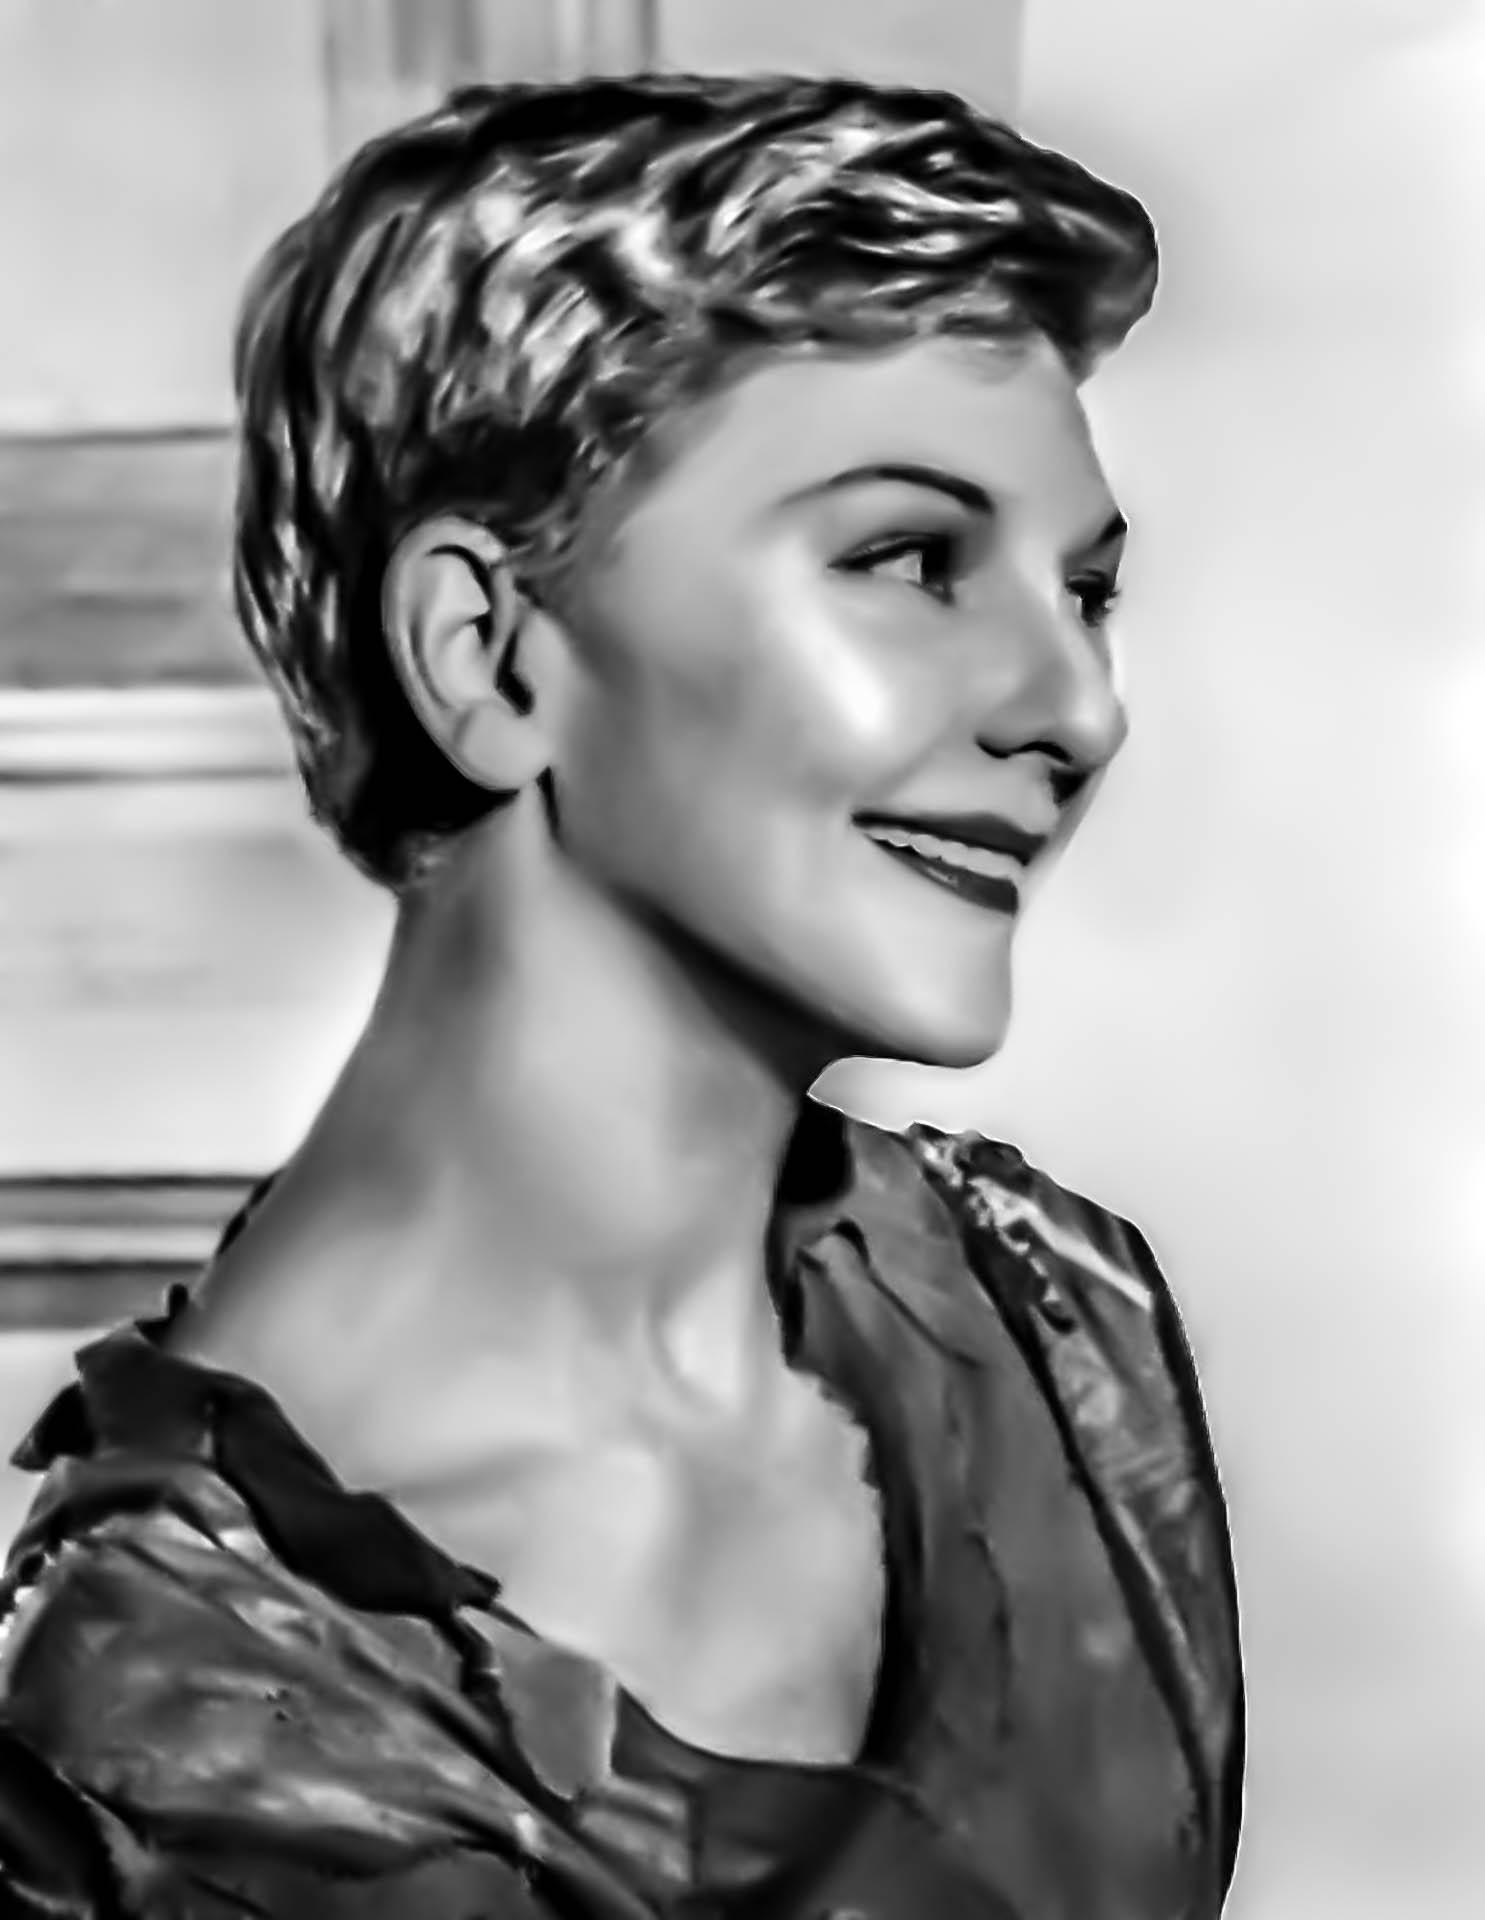 Fotoğraf Siyah Ve Beyaz Film Hollywood Portre Model Moda Tek